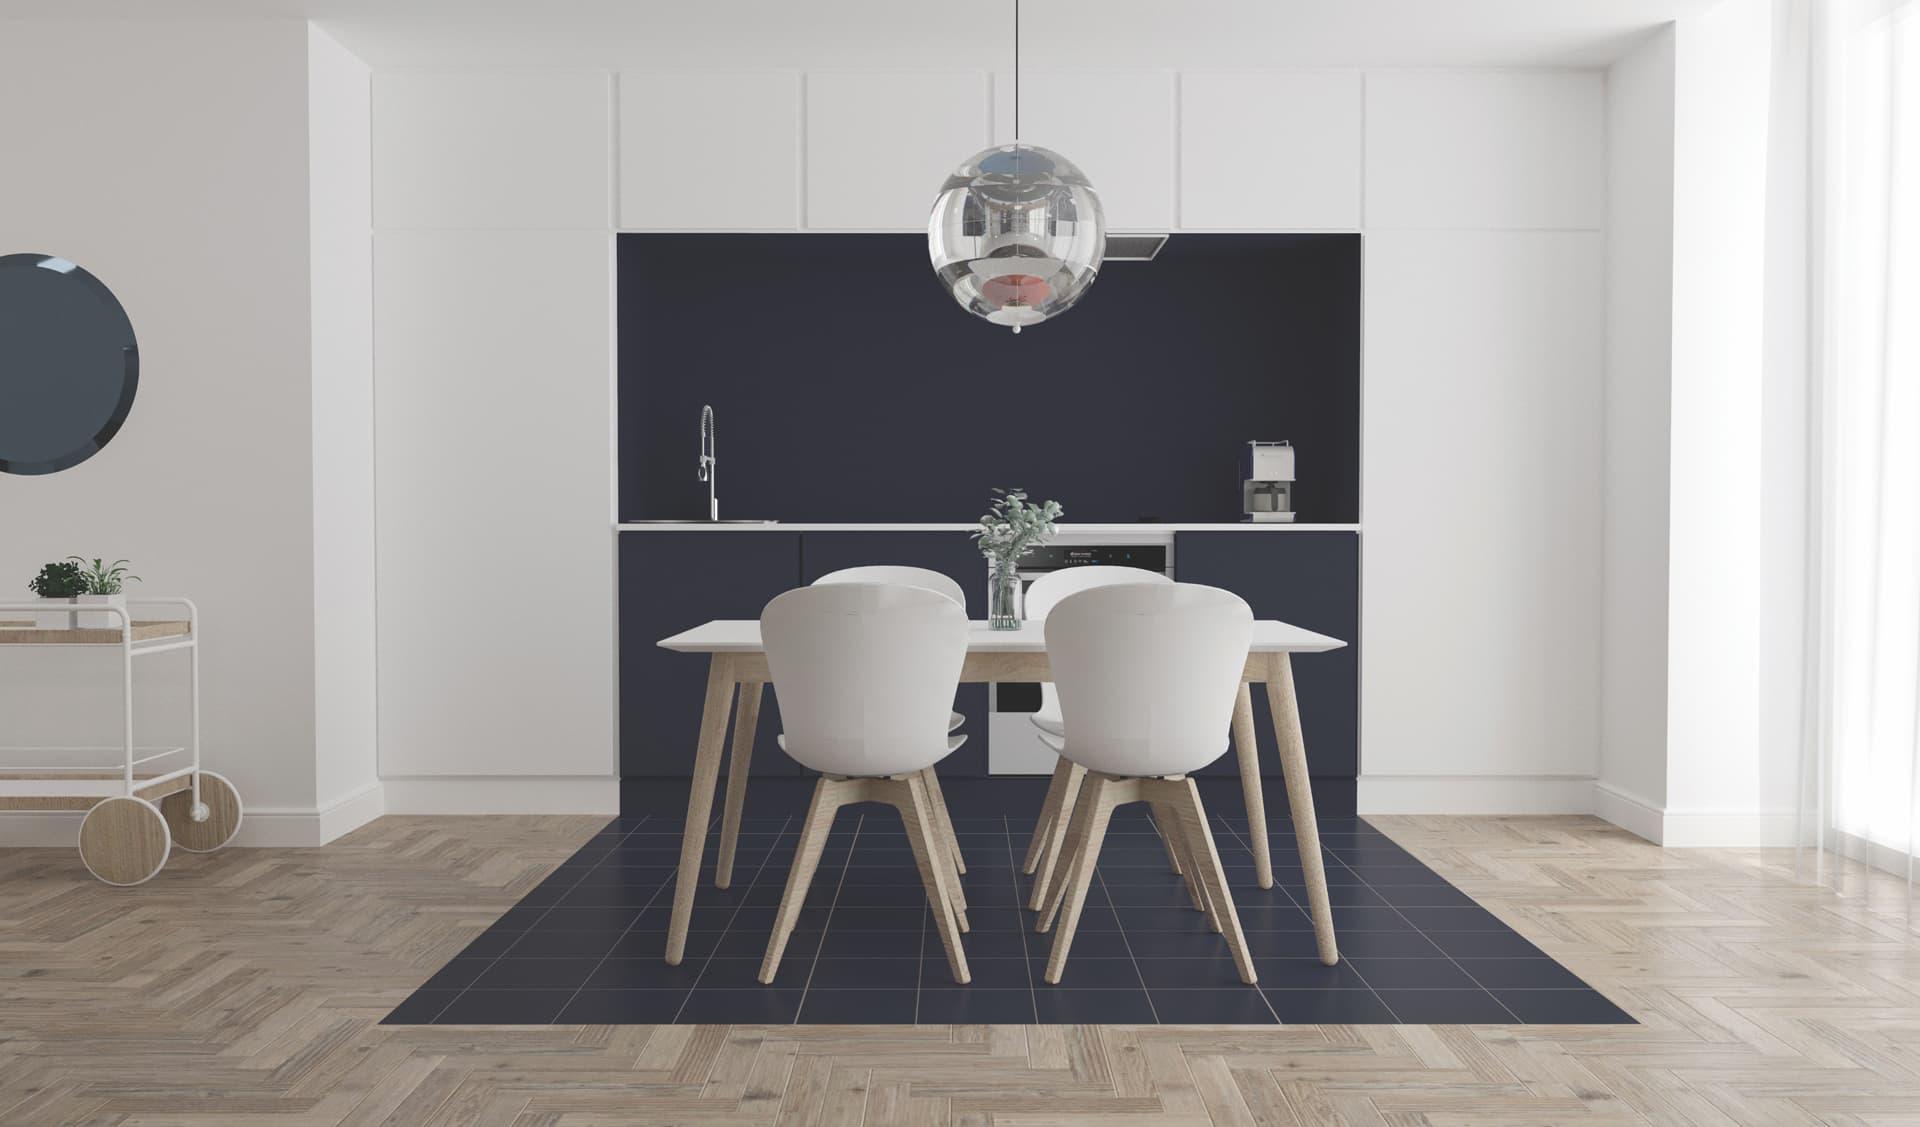 6/12 Dining Room, Loft, Design Package